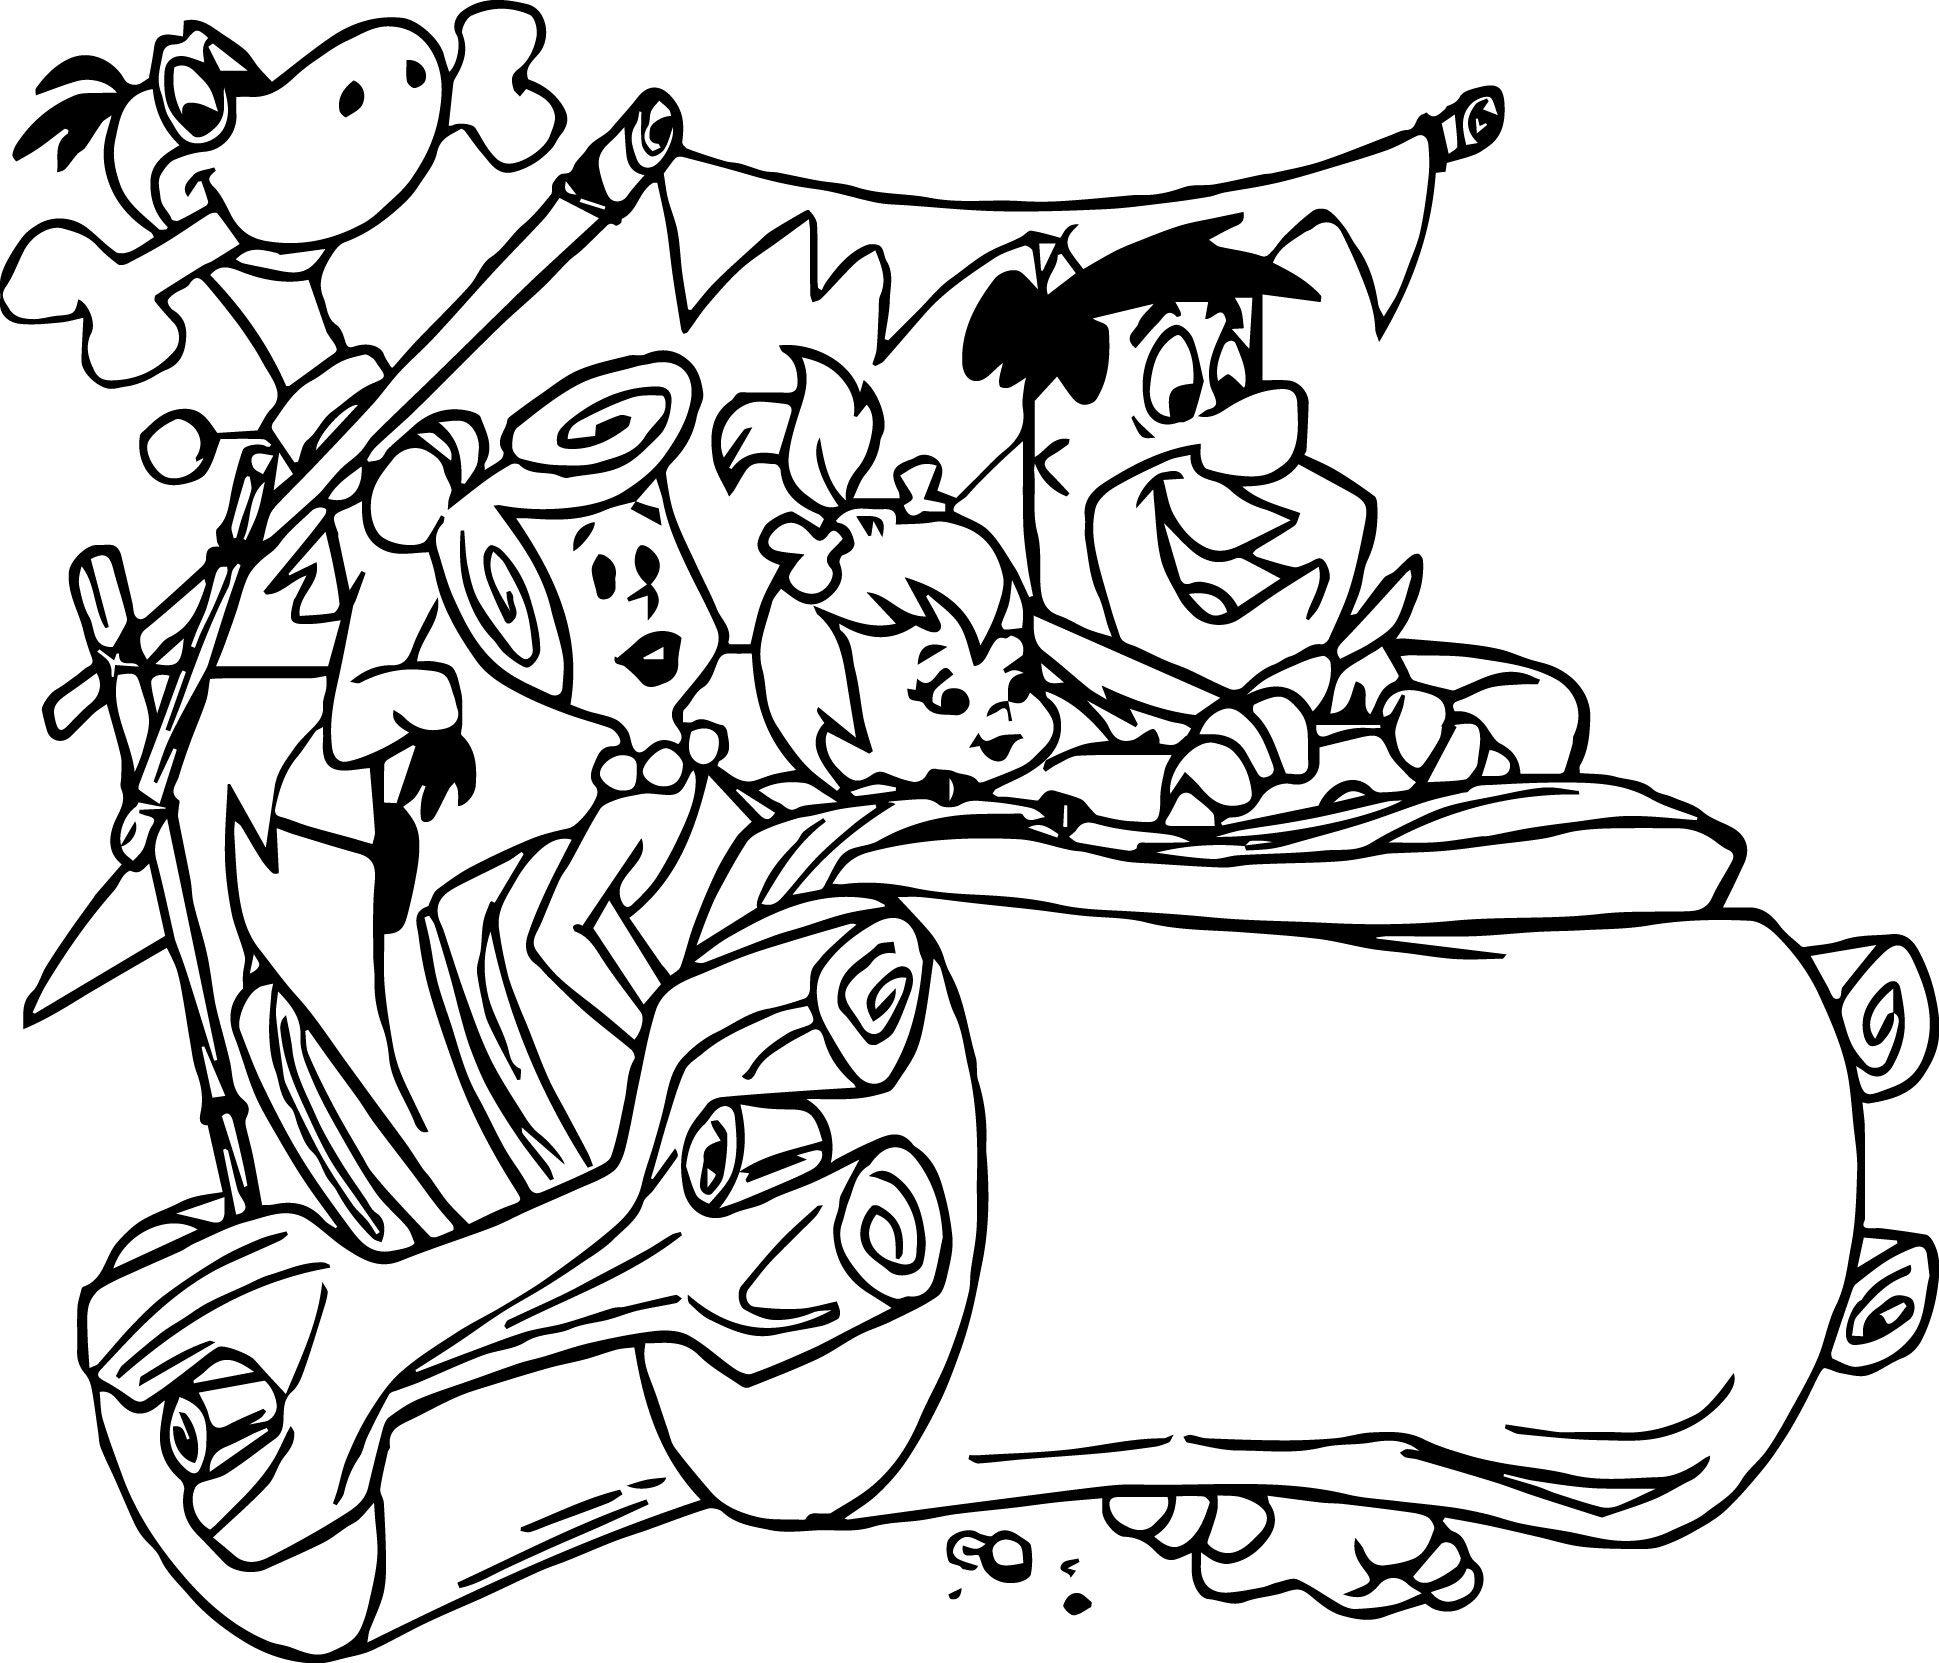 The Flintstones Coloring Pages